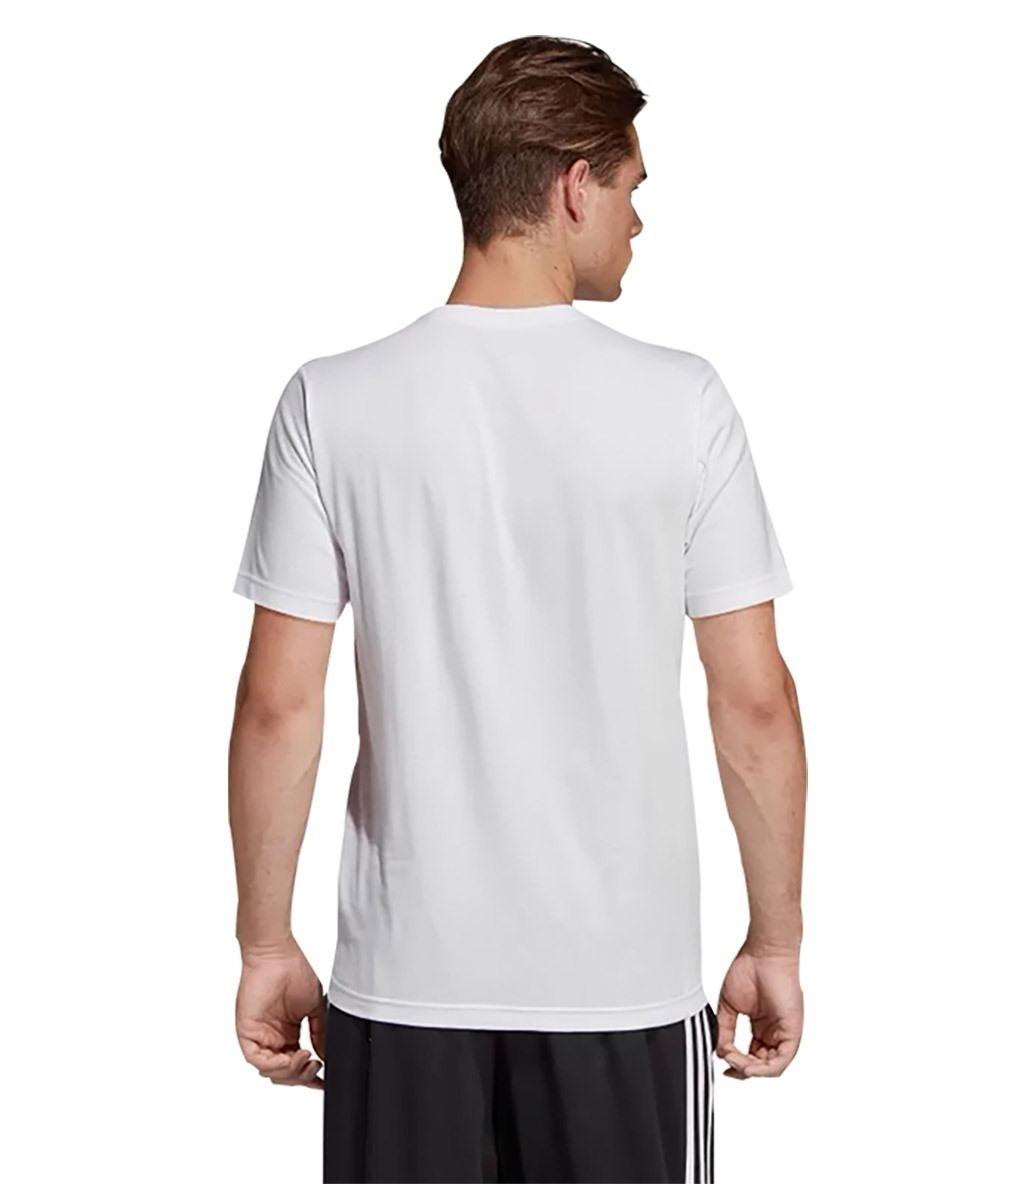 Adidas Essentials Plain T-Shirt Beyaz